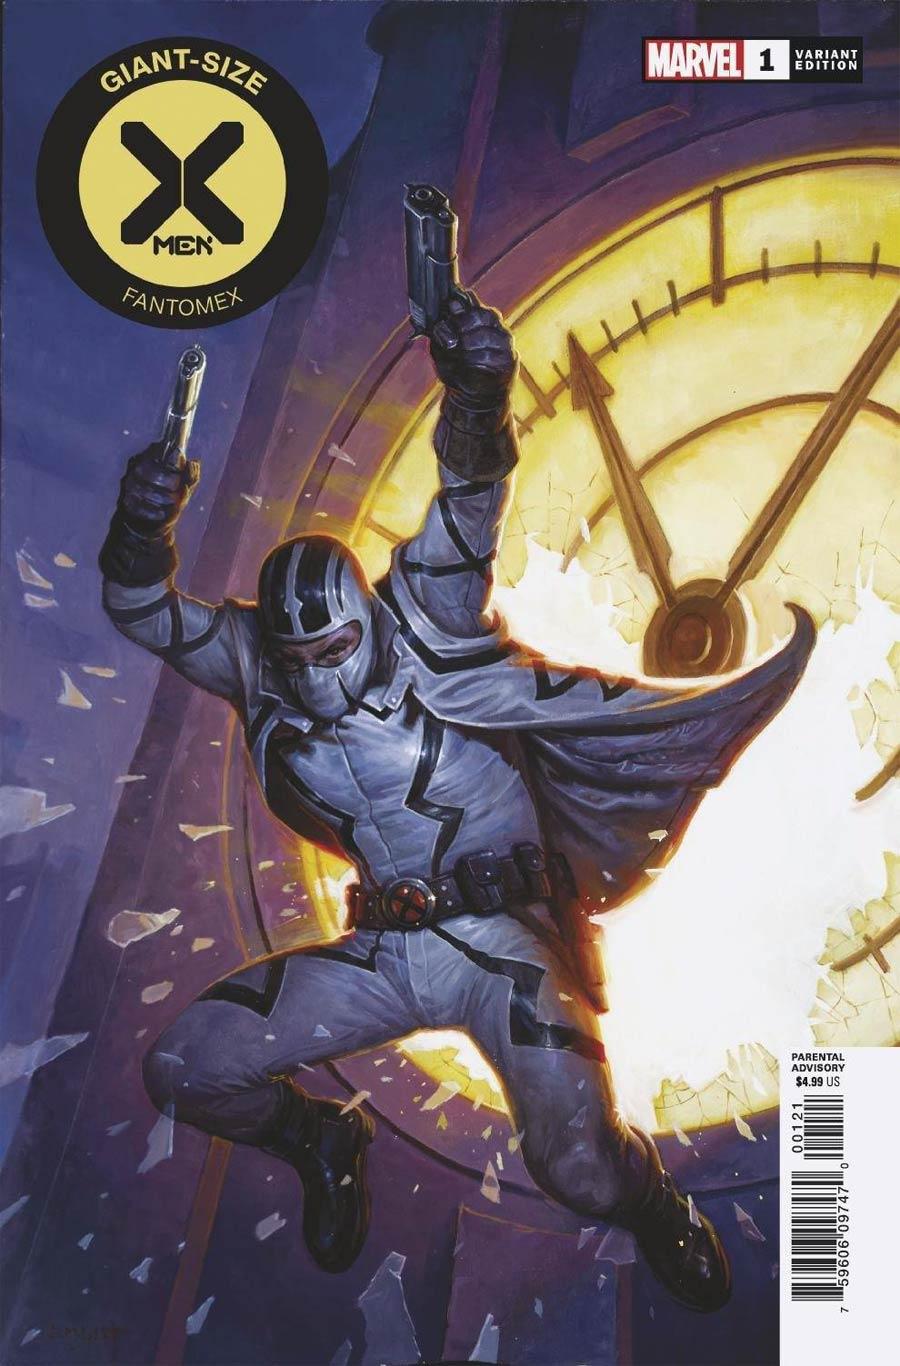 Giant-Size X-Men Fantomex #1 Cover B Variant EM Gist Cover